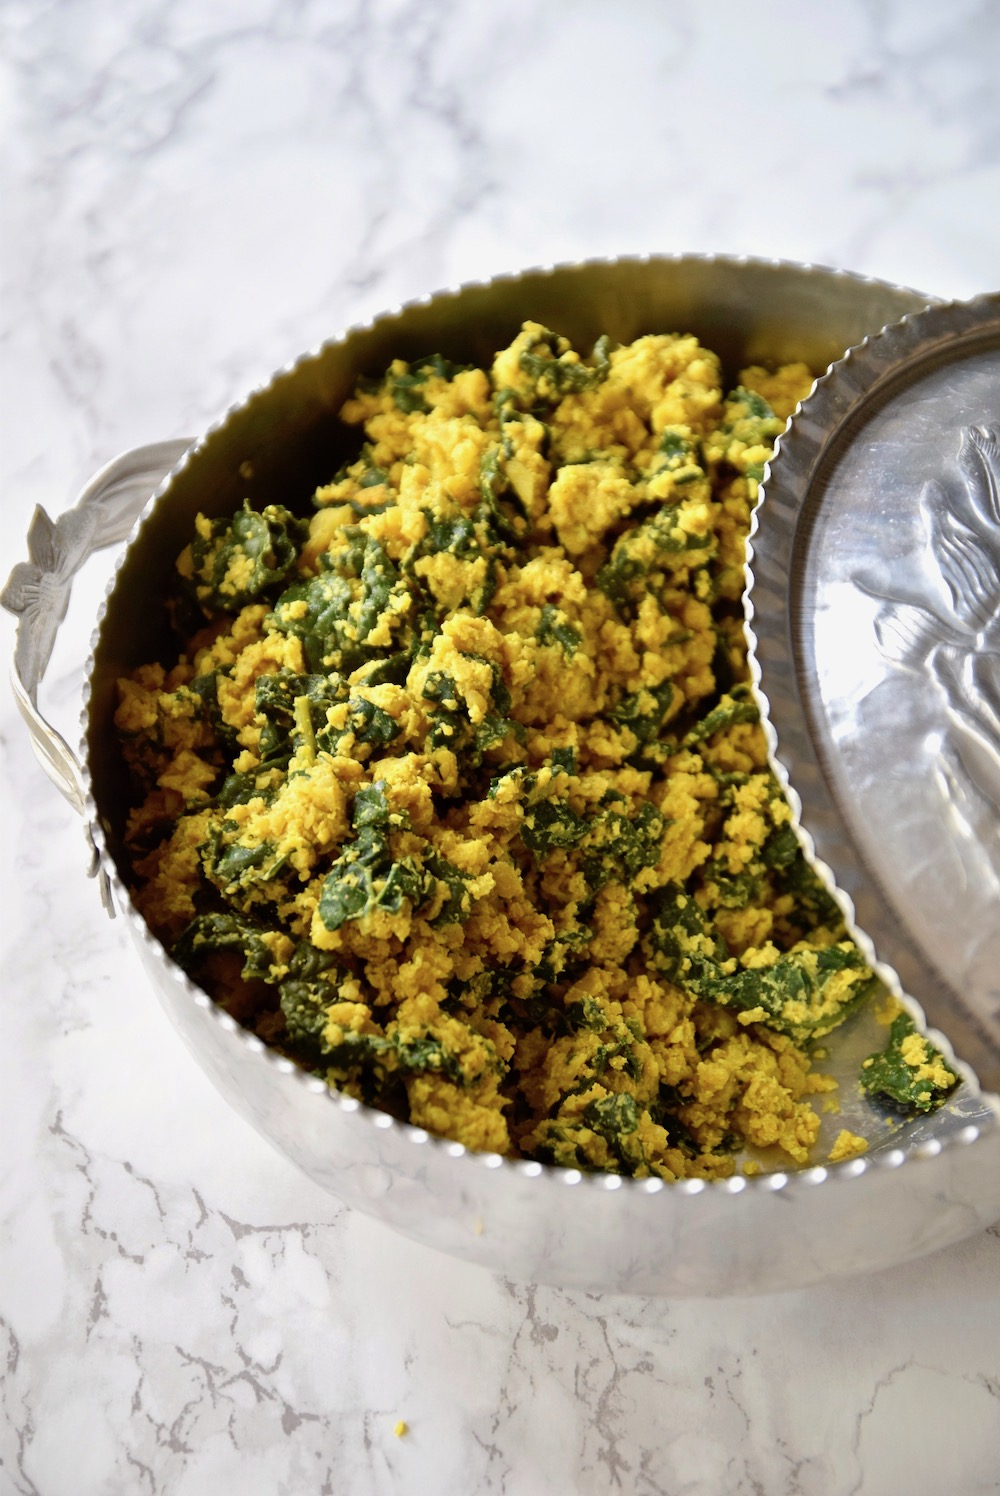 Curried cauliflower kale rice - gluten free, dairy free and vegan | TastingPage.com